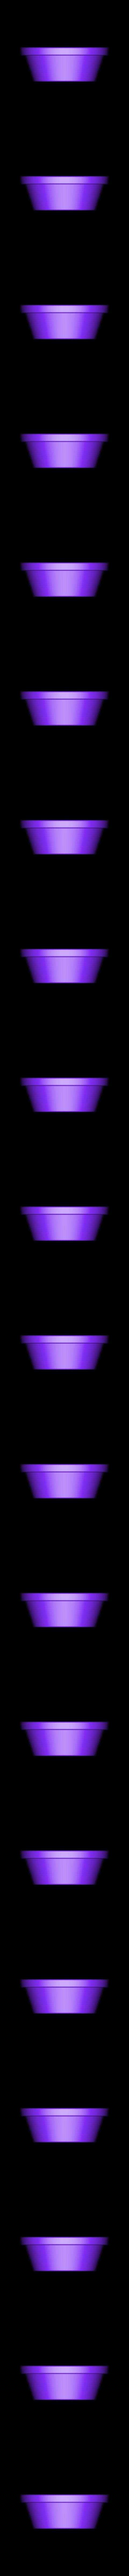 short_pot.stl Download free STL file Small potted succulents • 3D printing model, tone001